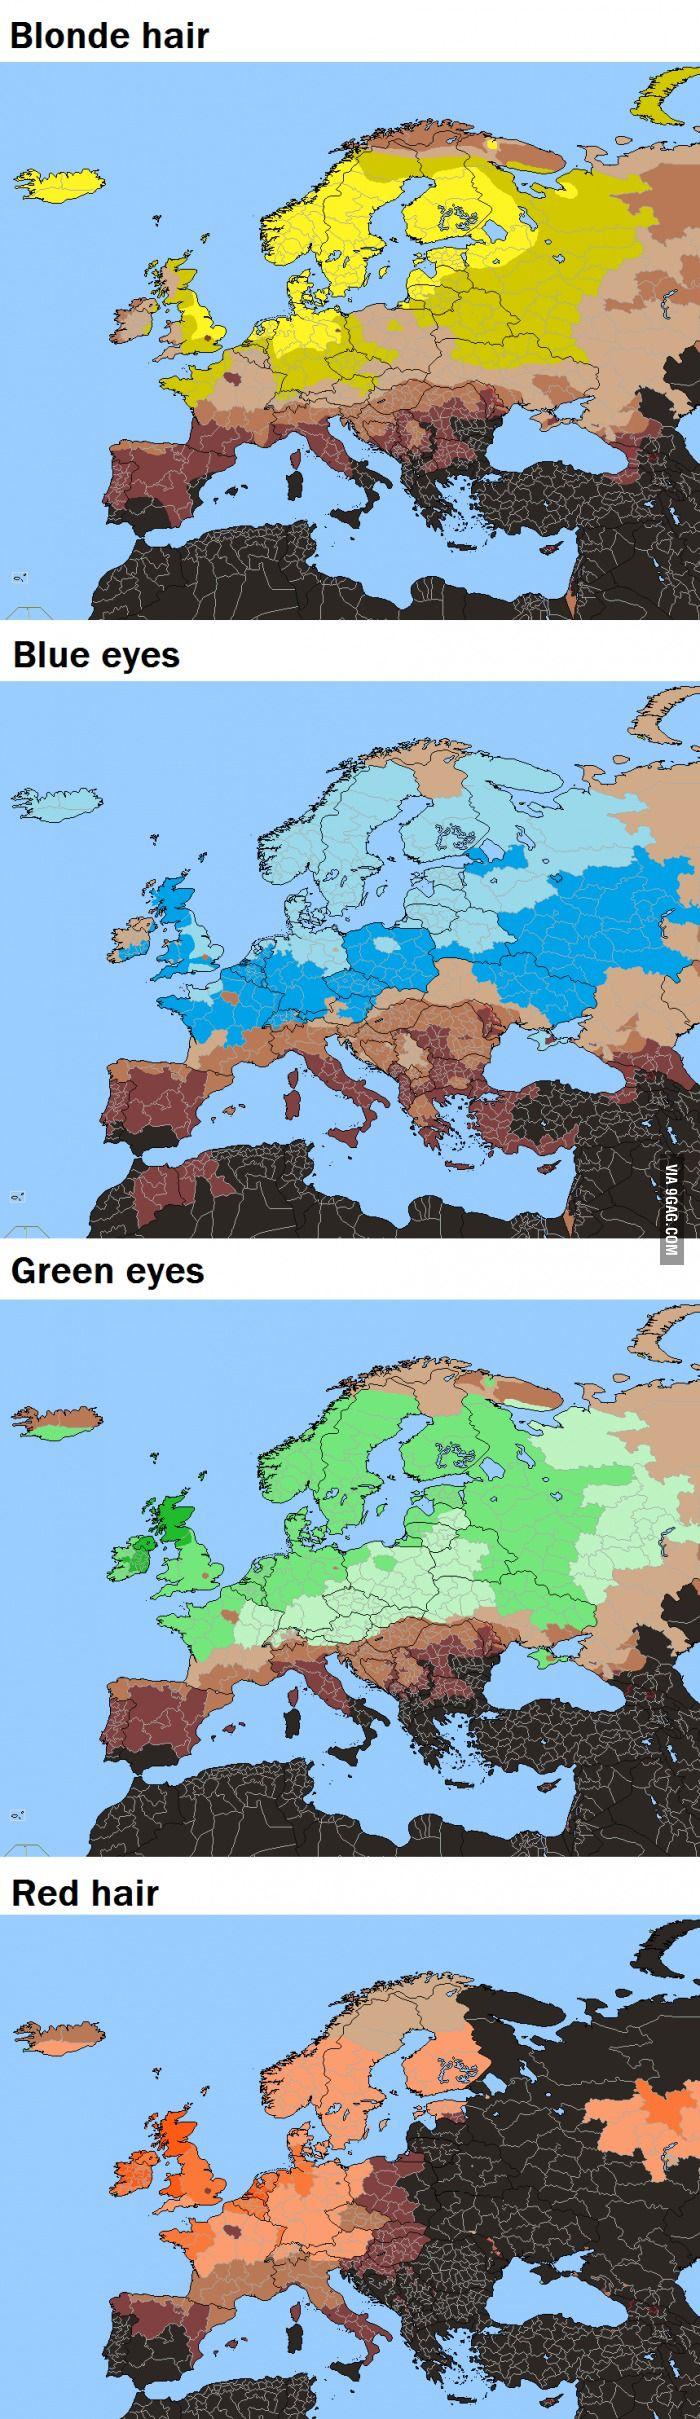 Blonde hair red hair blue eyes In Europe World Stats